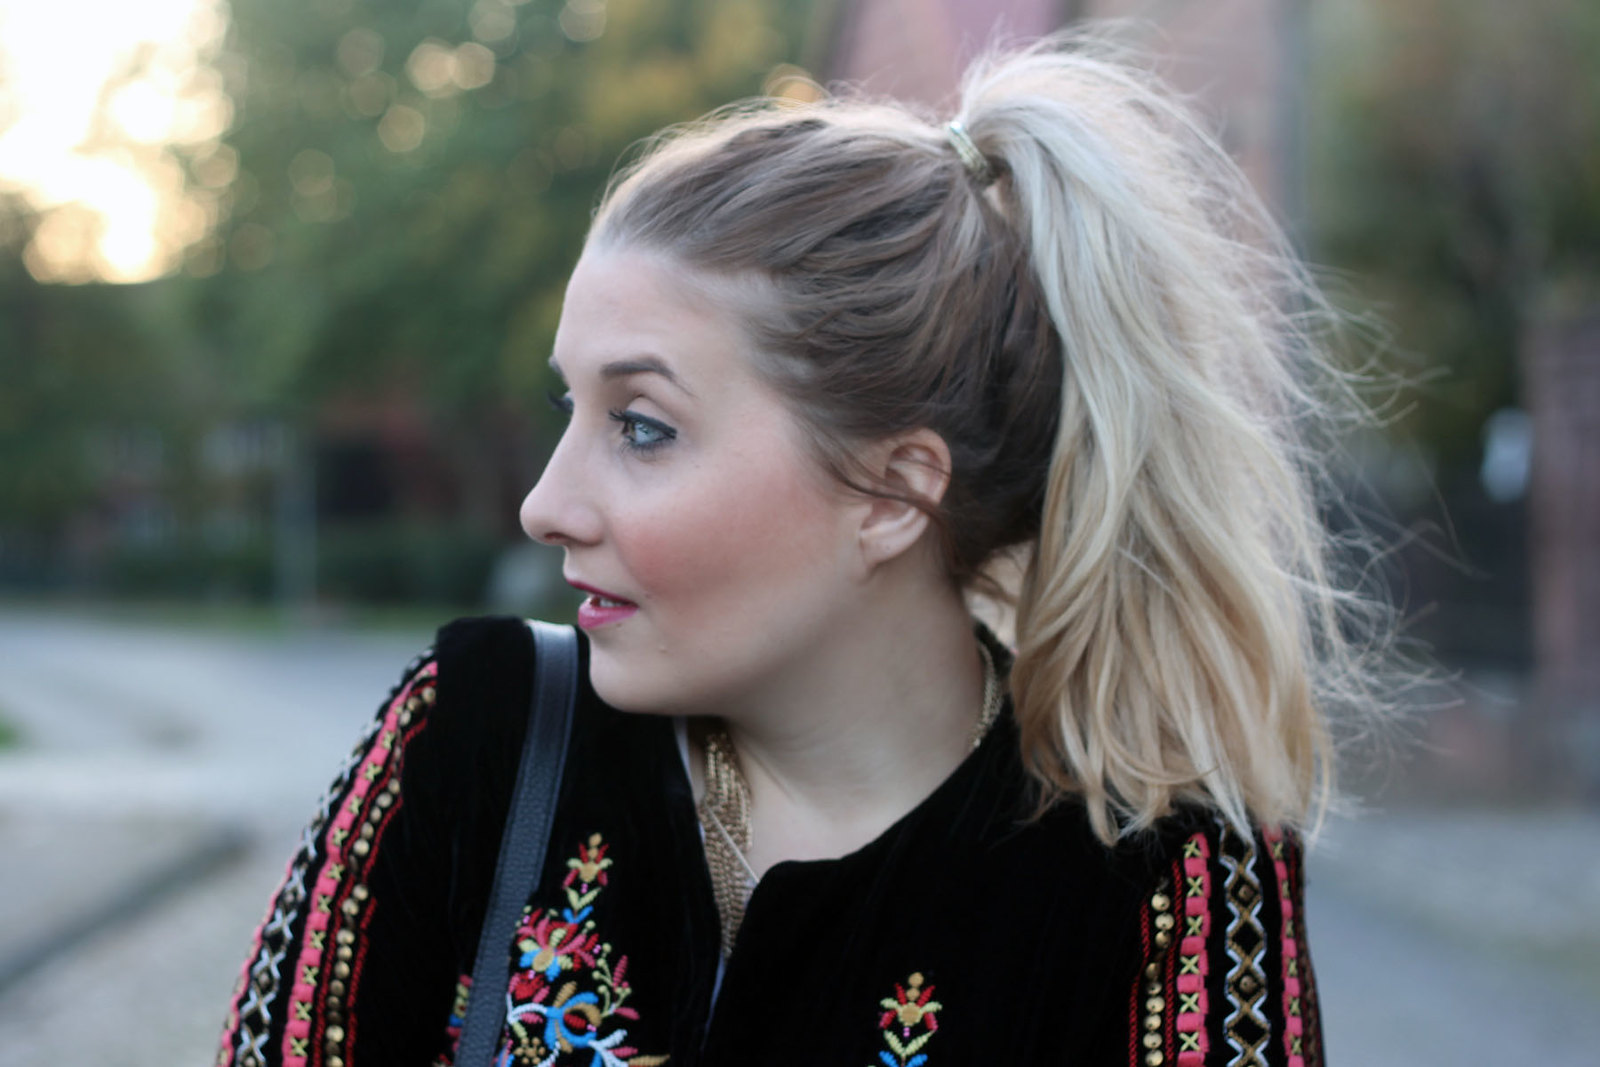 outfit-modeblog-zara-schwarze-jeans-fransenboots-frisur-trend-modeblogger-fashionblogger